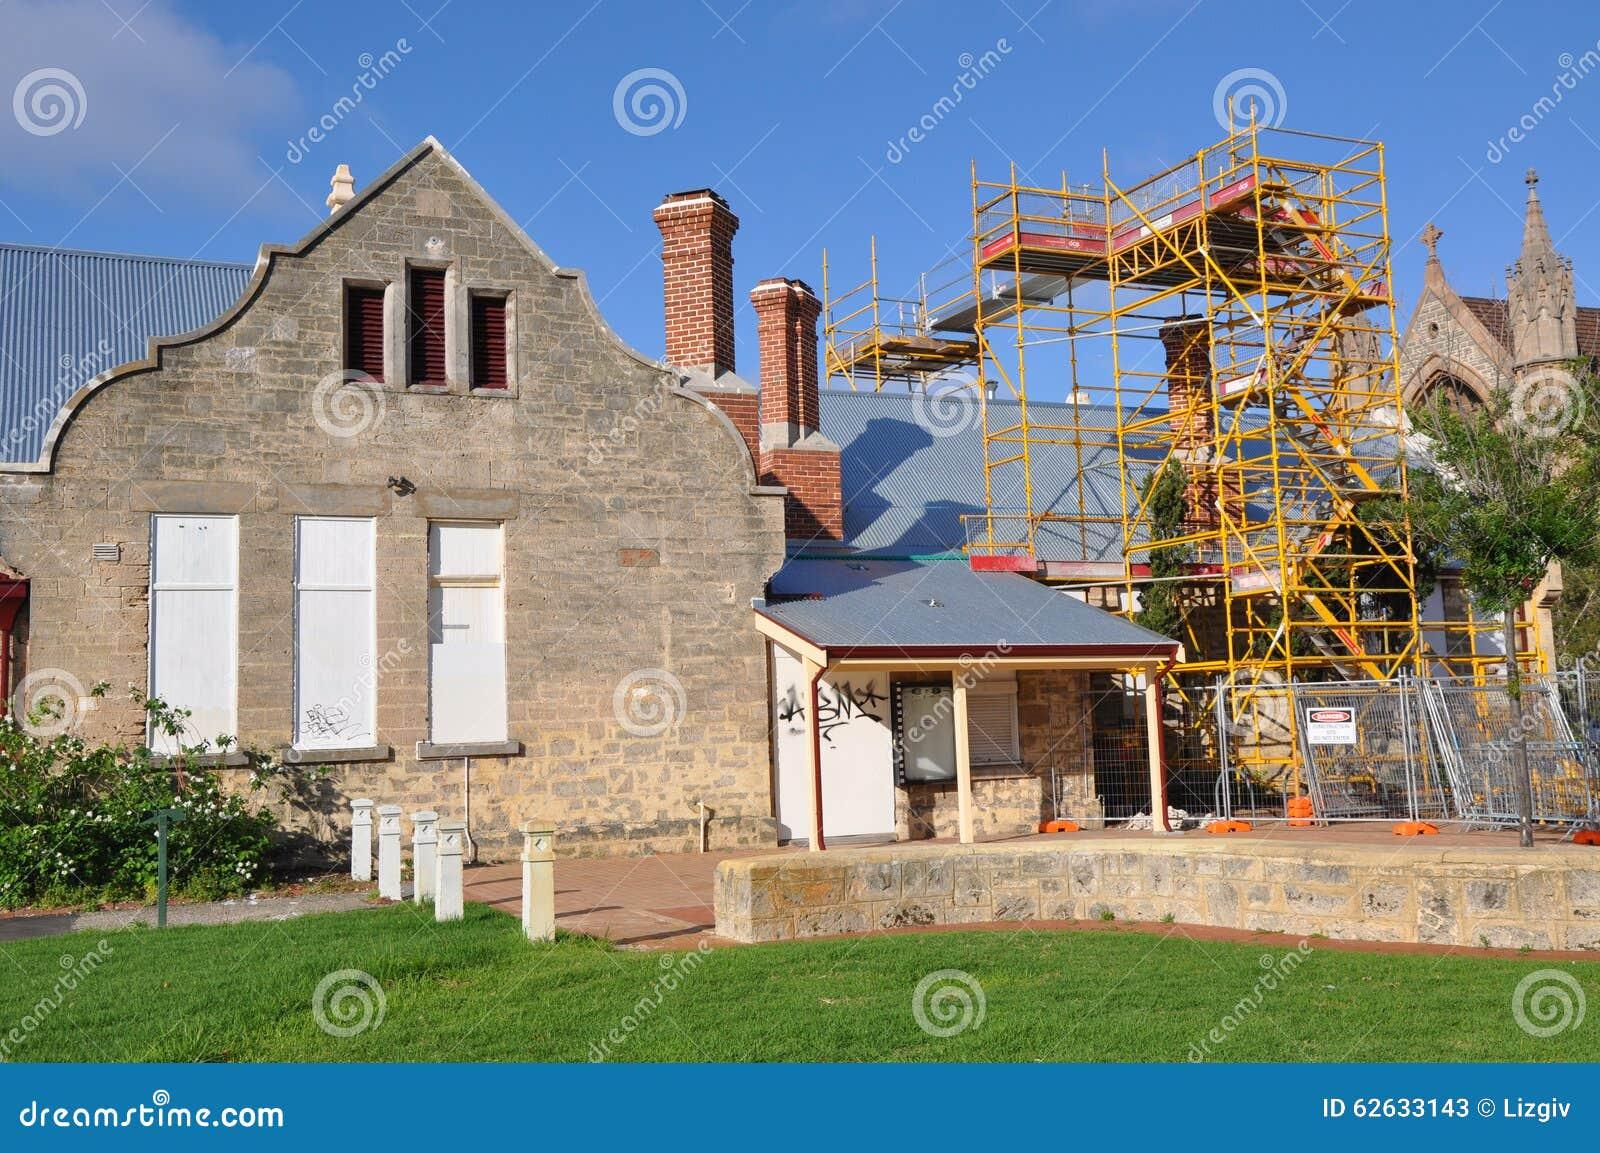 Former Boy s School Limestone Architecture: Fremantle, Western Australia